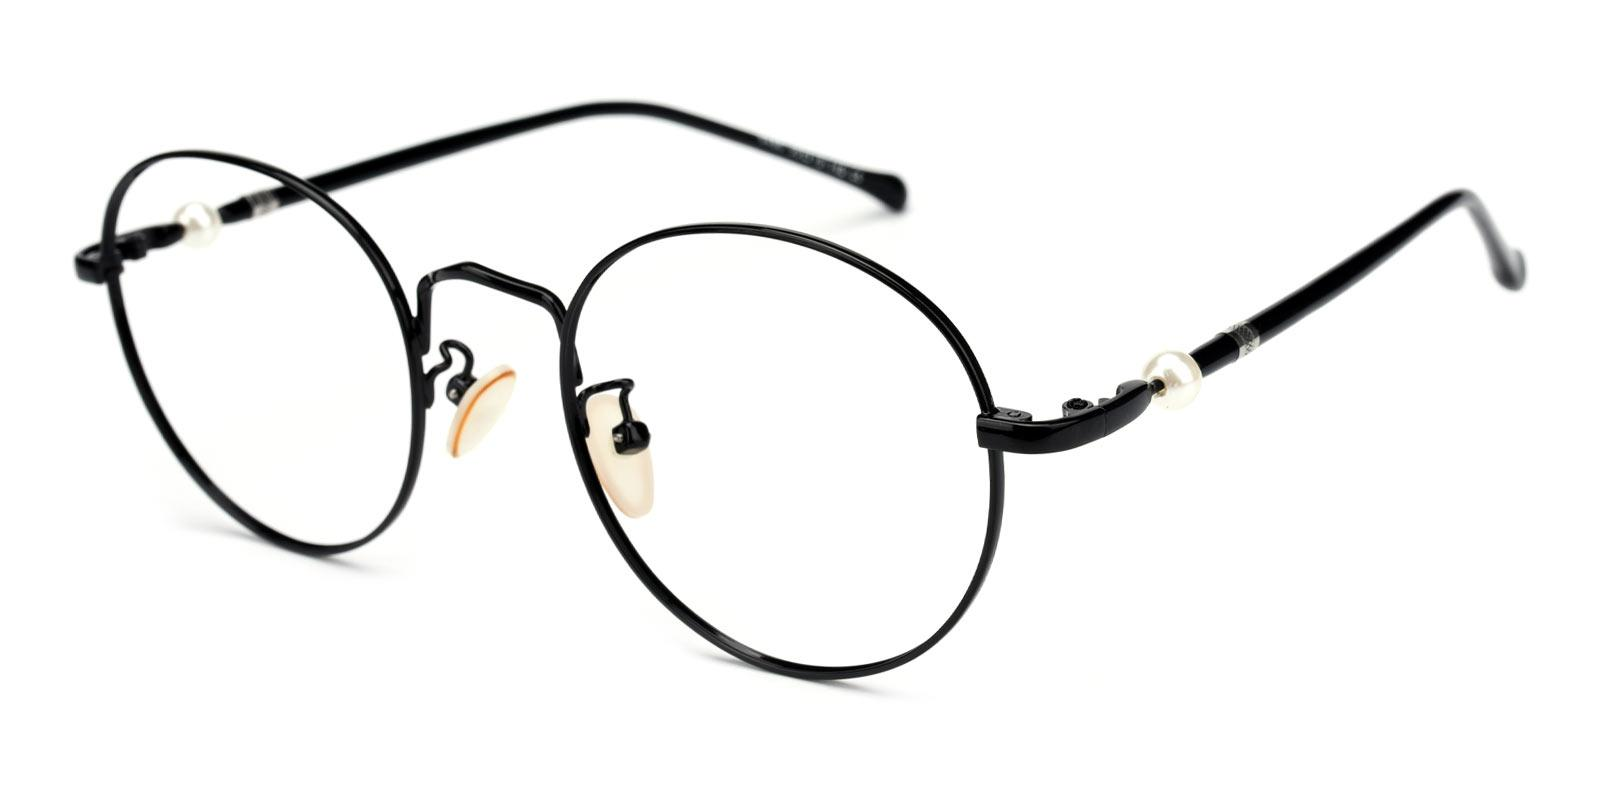 Oswego-Black-Round-Metal-Eyeglasses-additional1